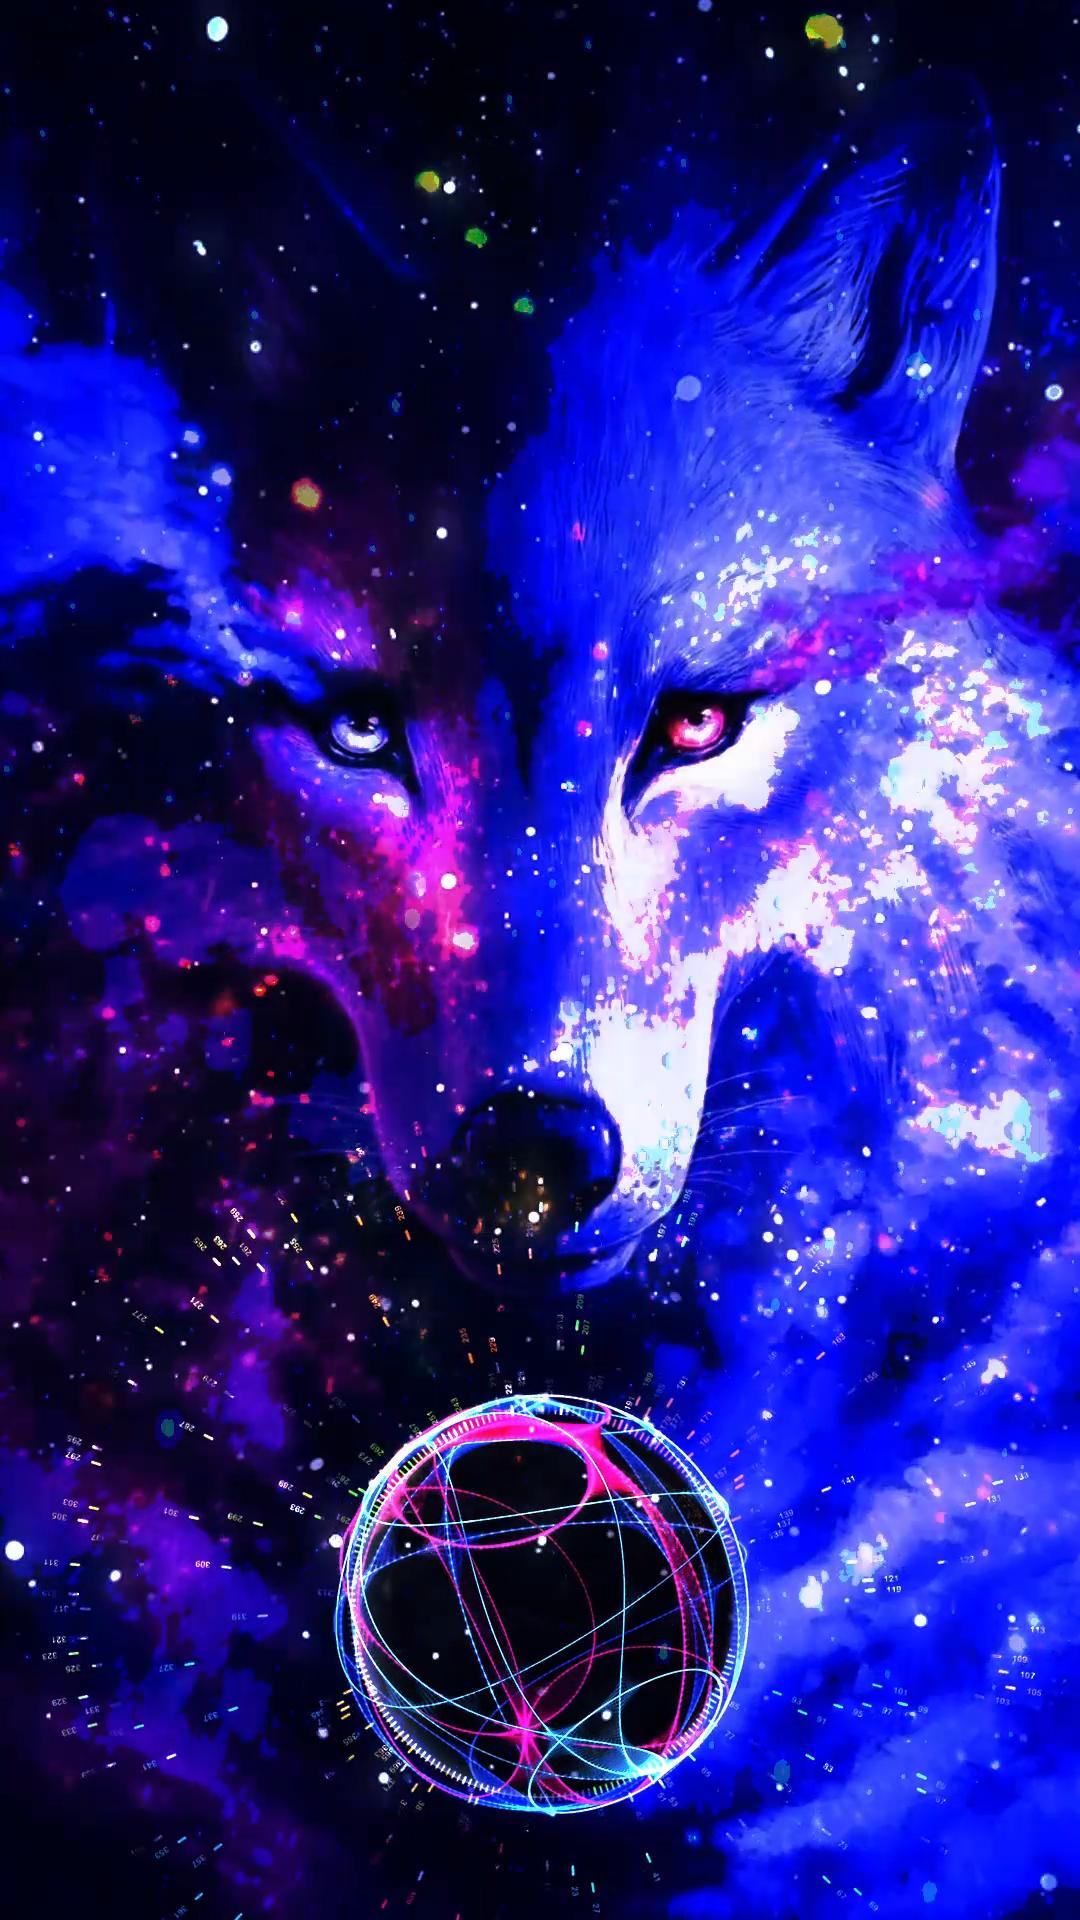 Creditcard Animation In 2020 Wolf Wallpaper Wolf Spirit Animal Anime Wolf